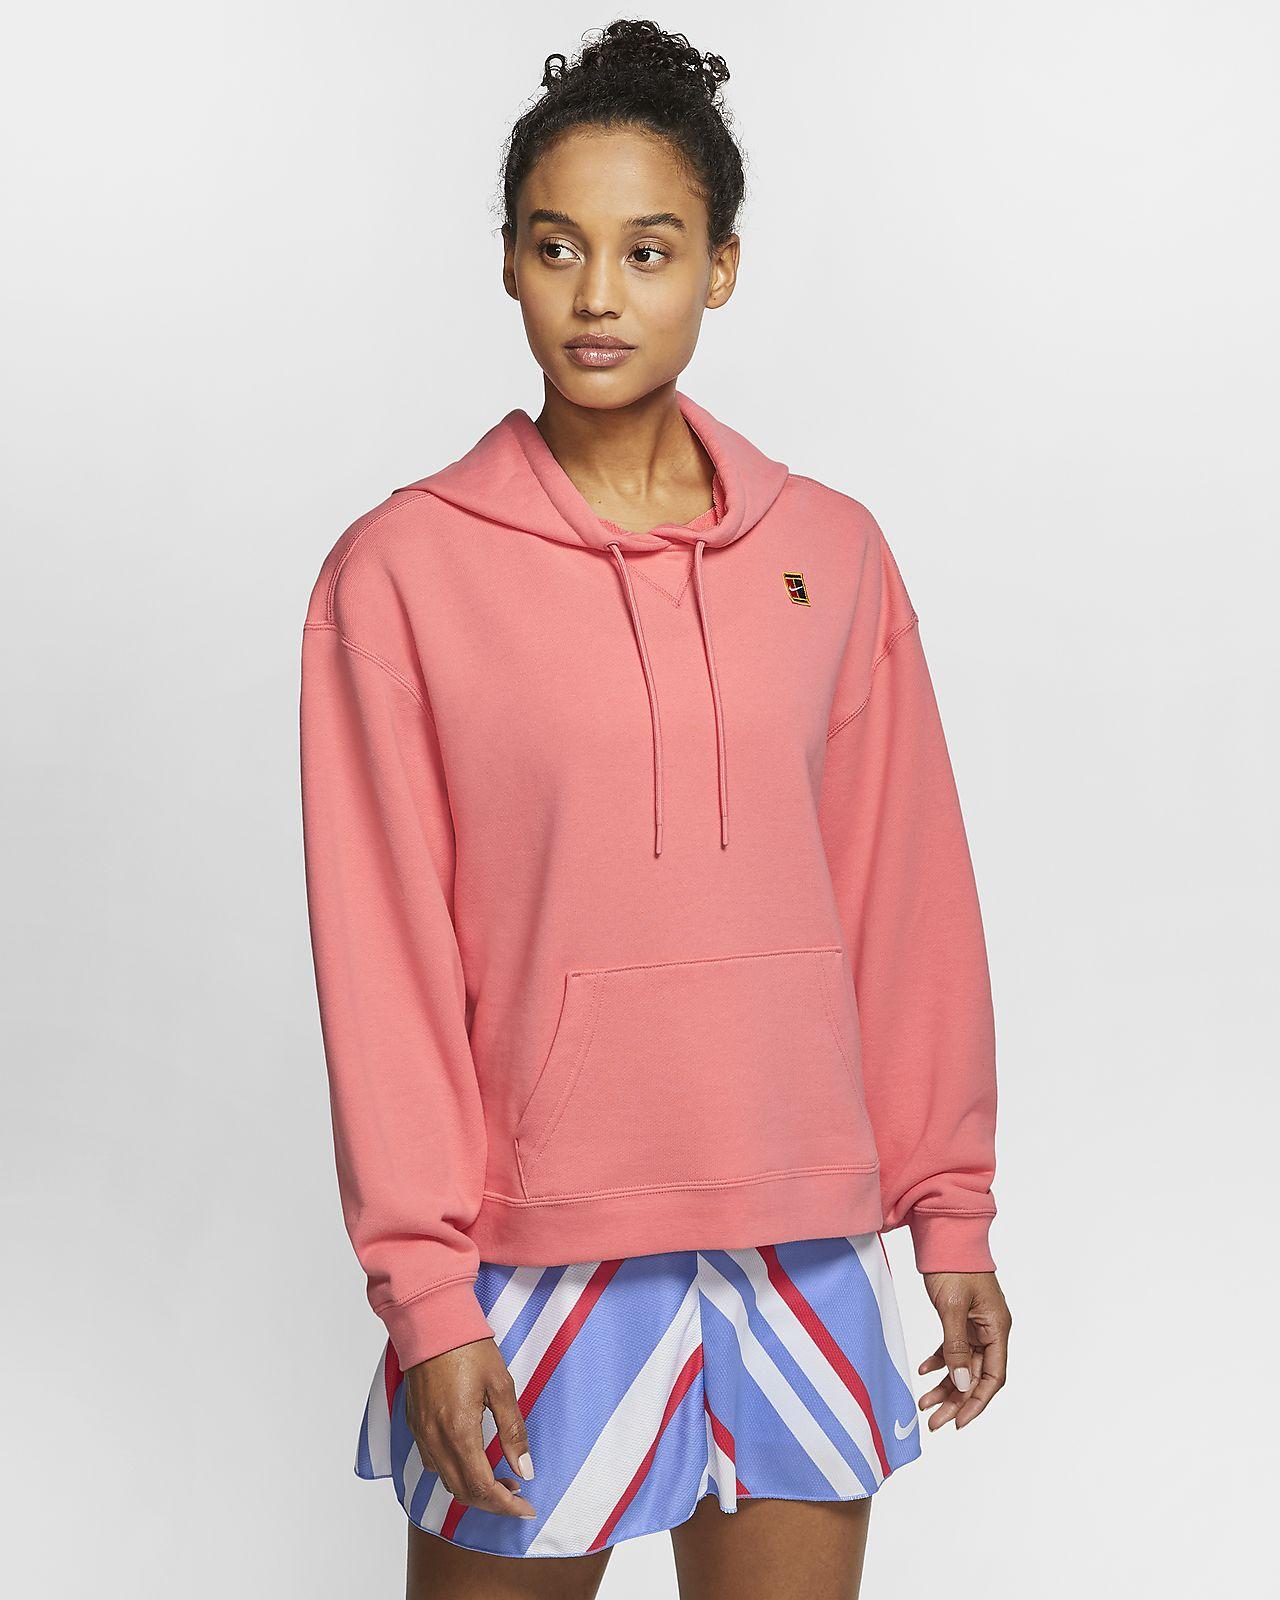 Felpa da tennis con cappuccio NikeCourt - Donna